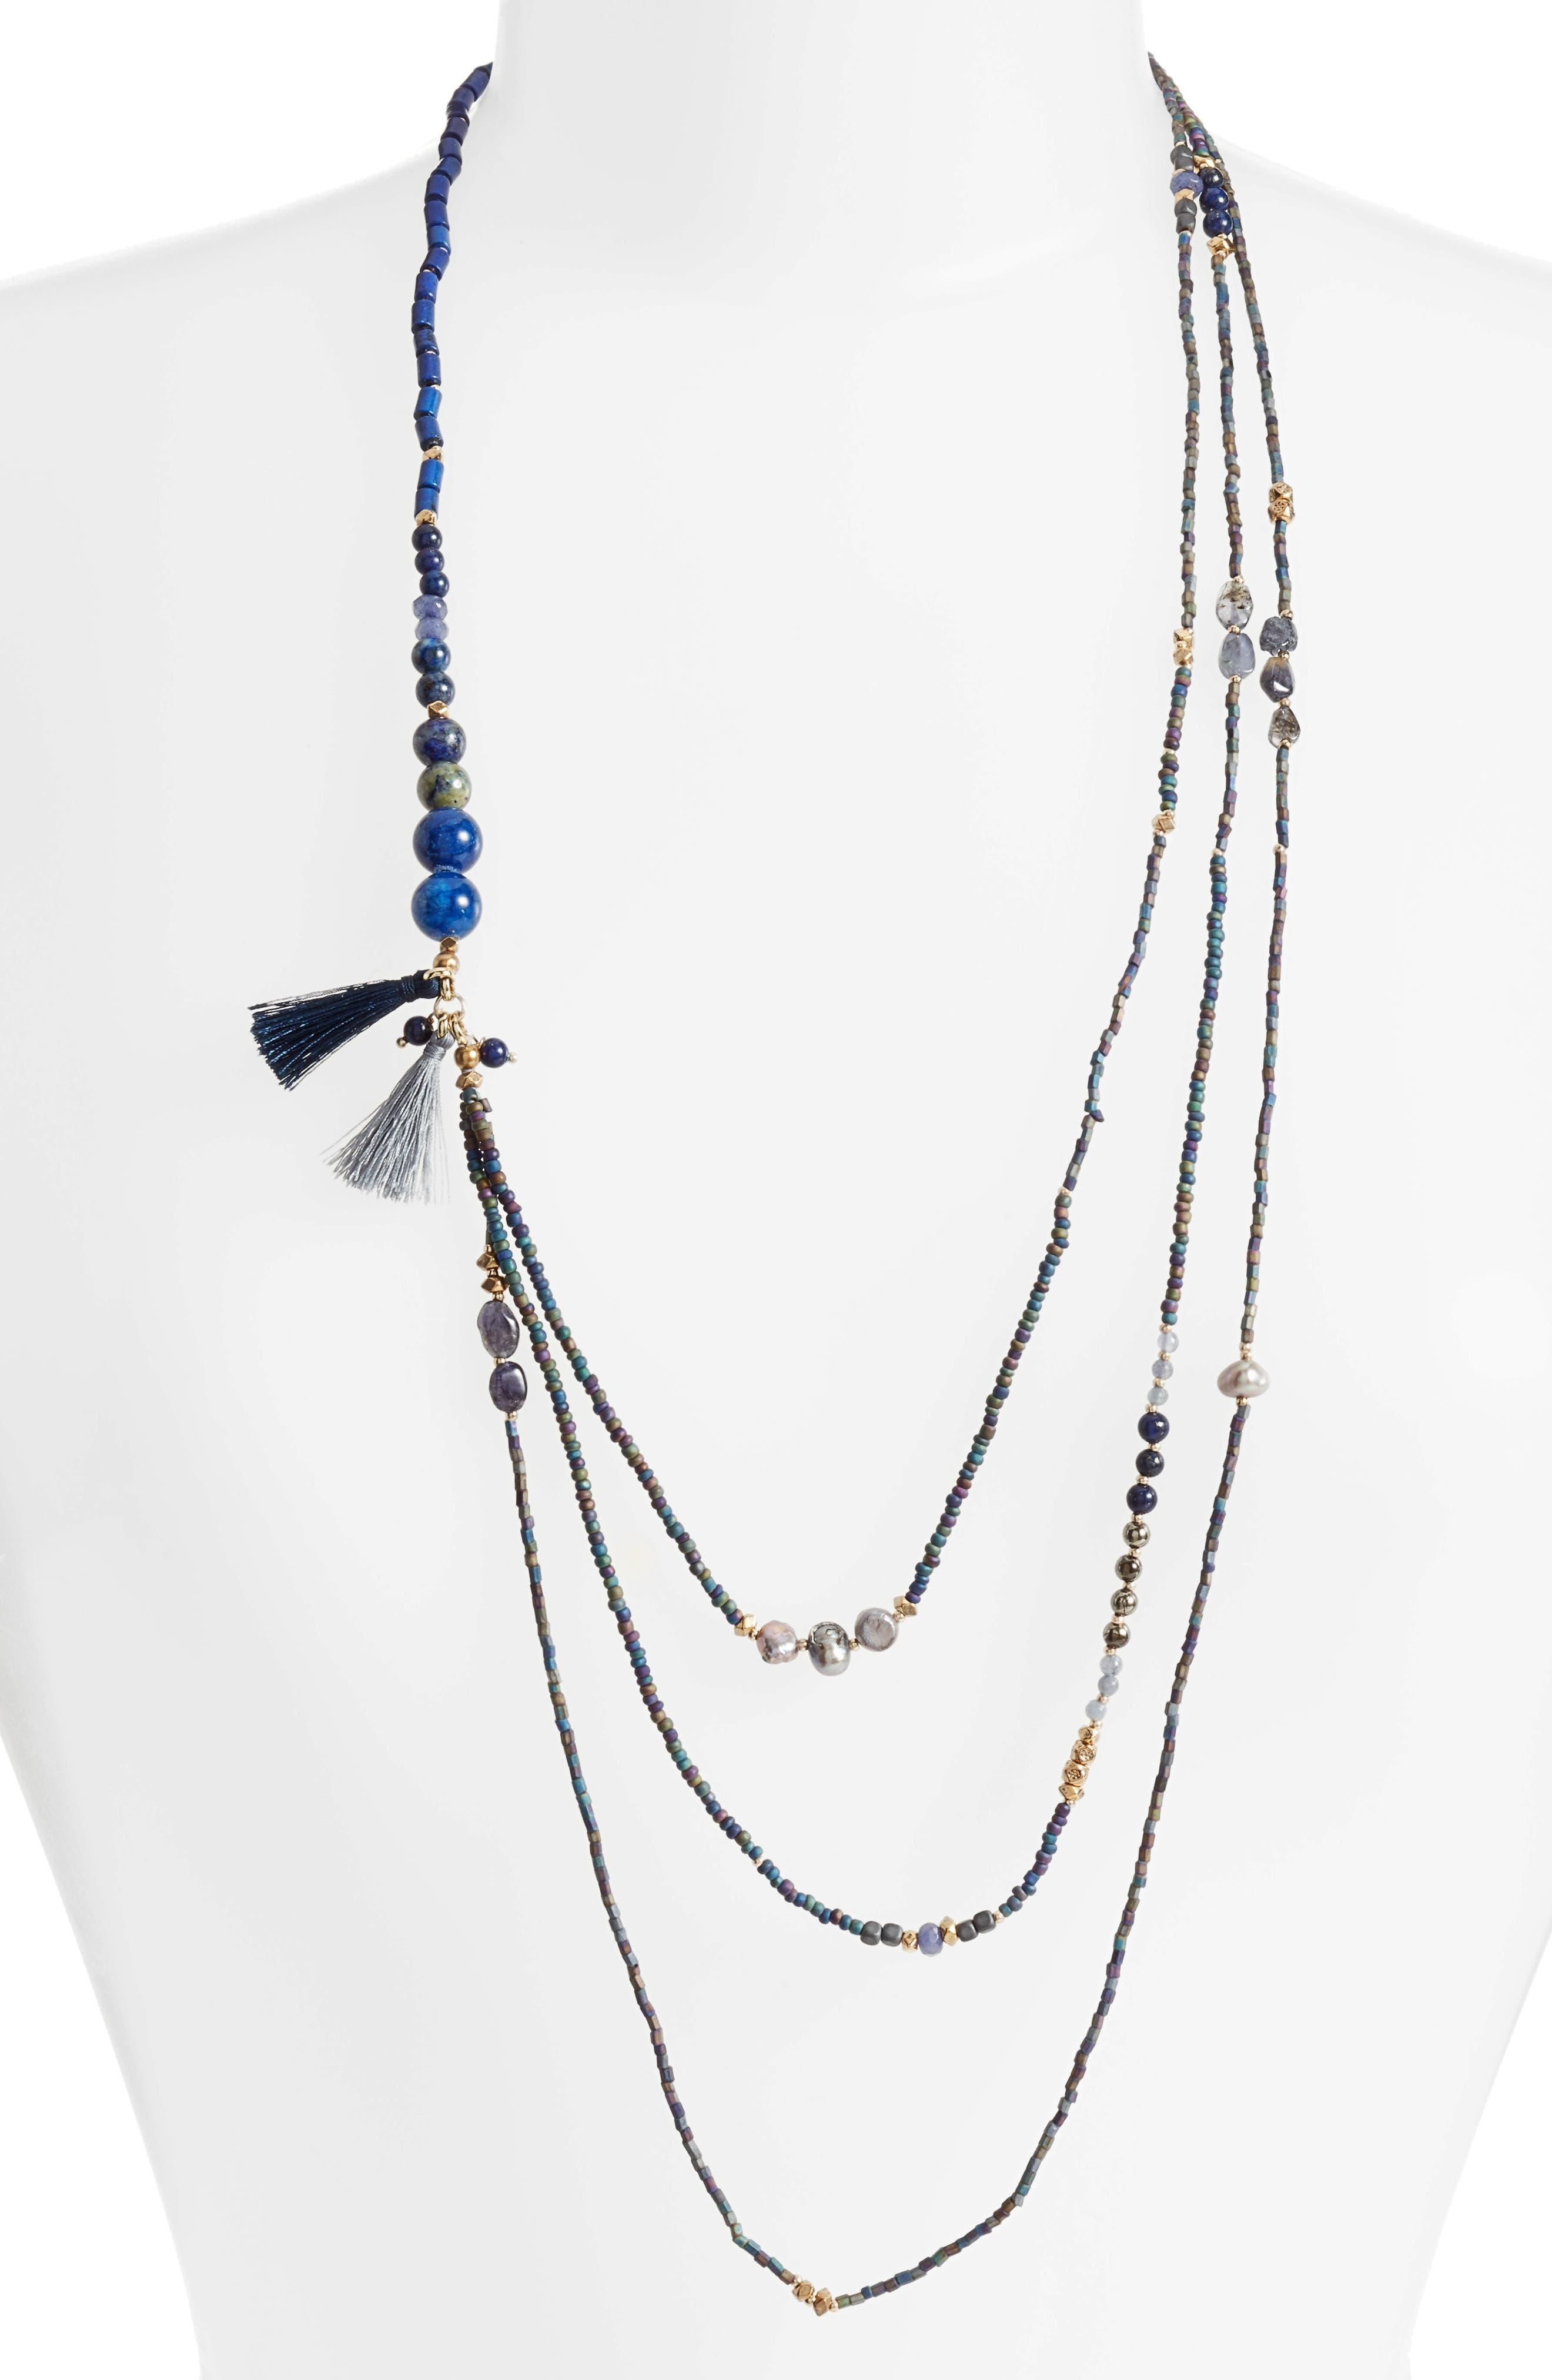 Konia Multistrand Tassel Necklace,                             Main thumbnail 1, color,                             400